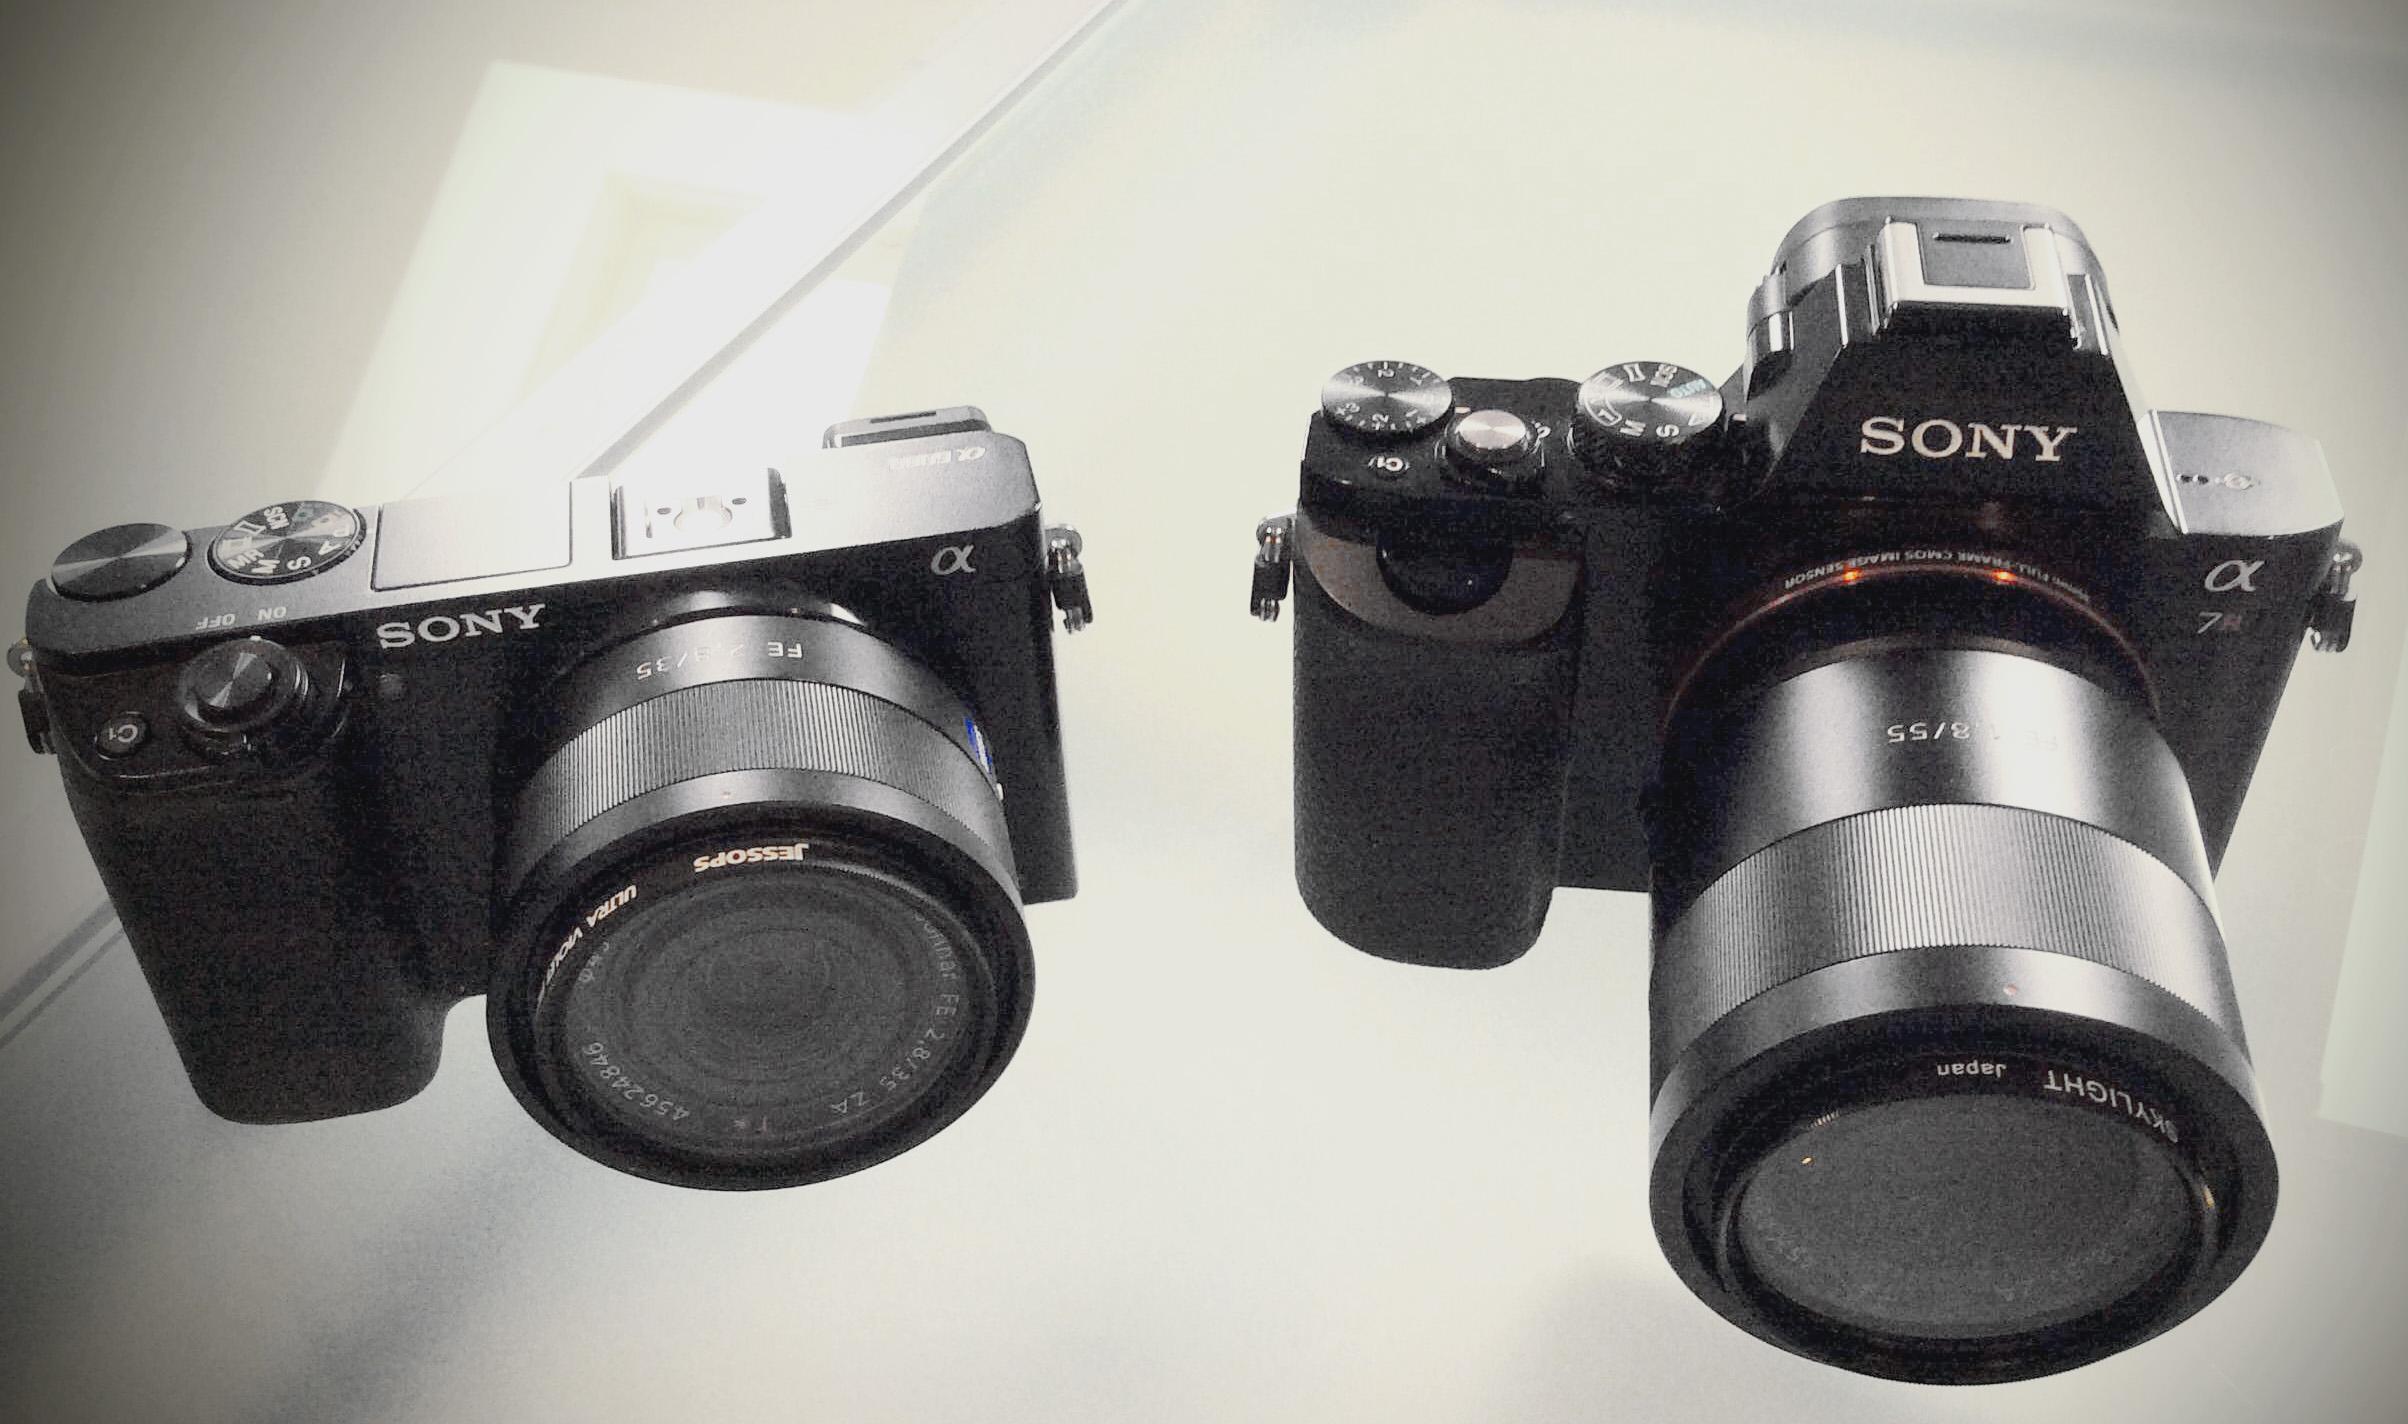 Sony a6000,  Sony FE 35mm f2.8 ZA Carl Zeiss Sonnar T* Lens Sony A7r,Sony SEL55F18Z E-mount Carl Zeiss Full Frame Prime Lens